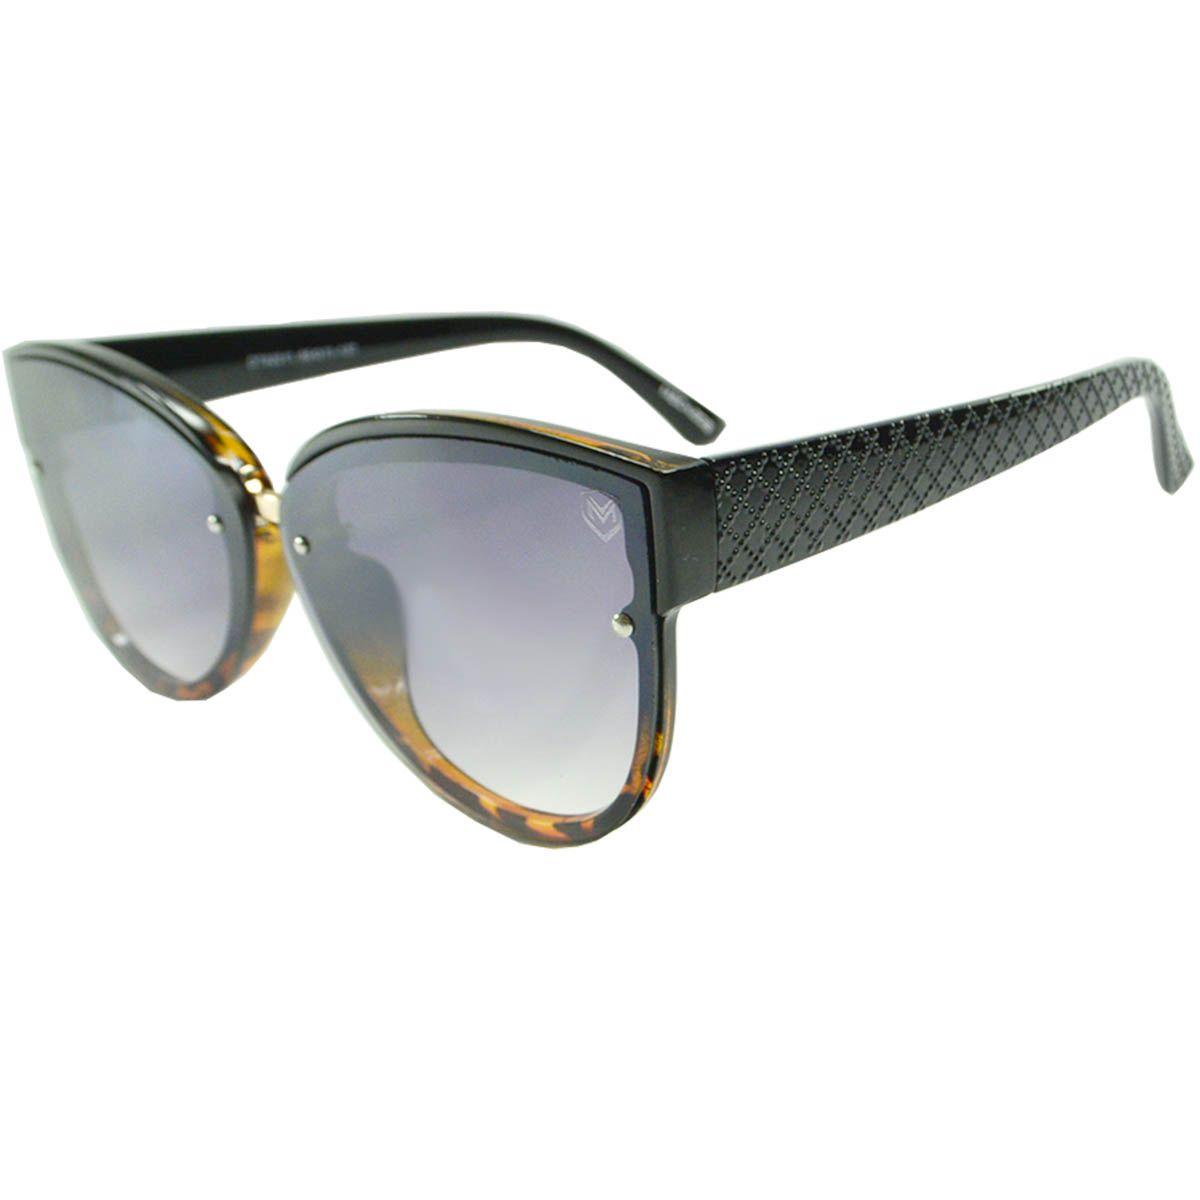 0689f69a73917 Óculos de Sol Feminino Mackage MK92011PT Preto Tarta - Mackage ...